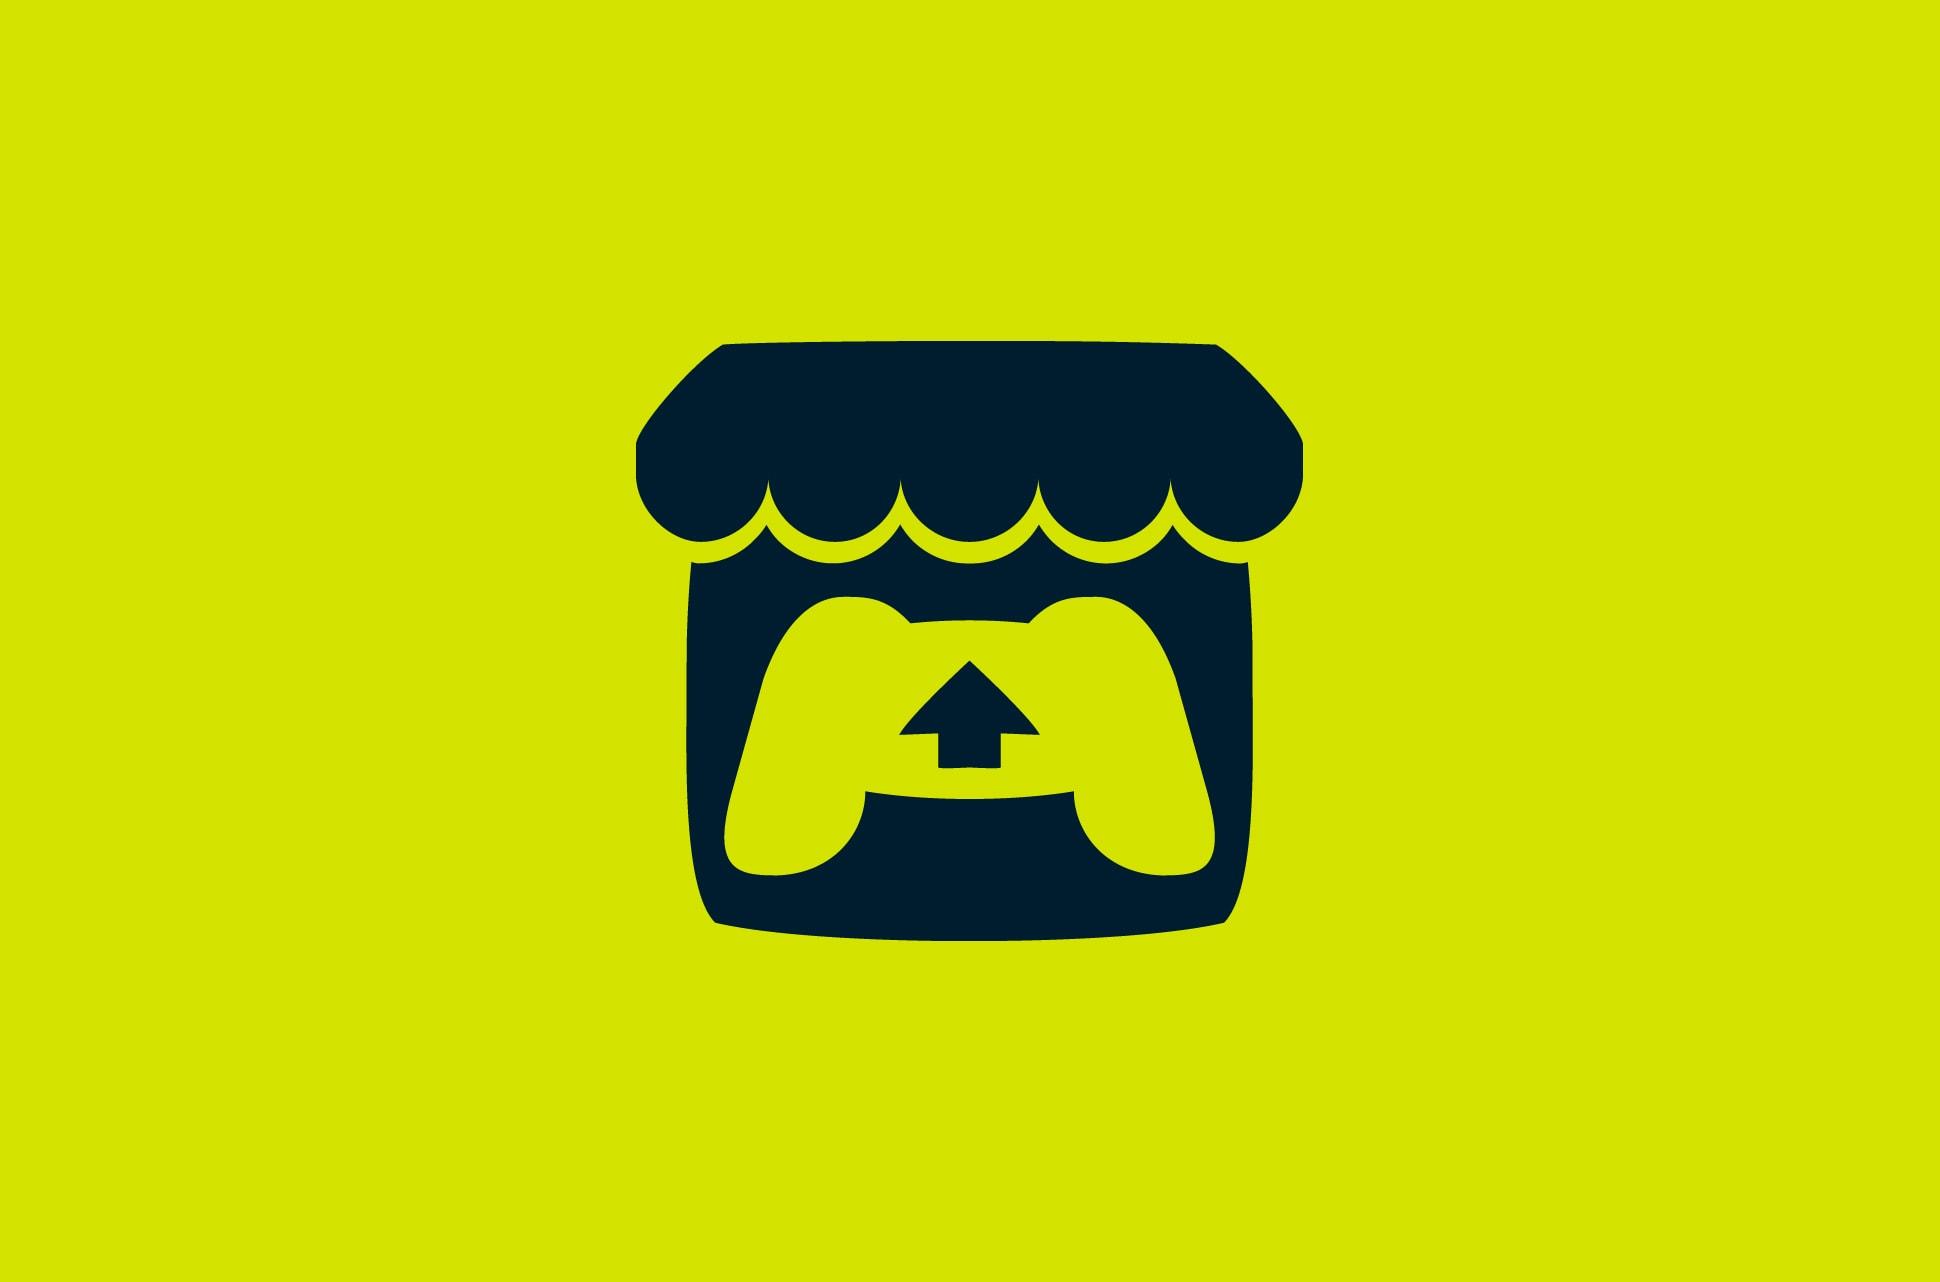 itch.io logo.